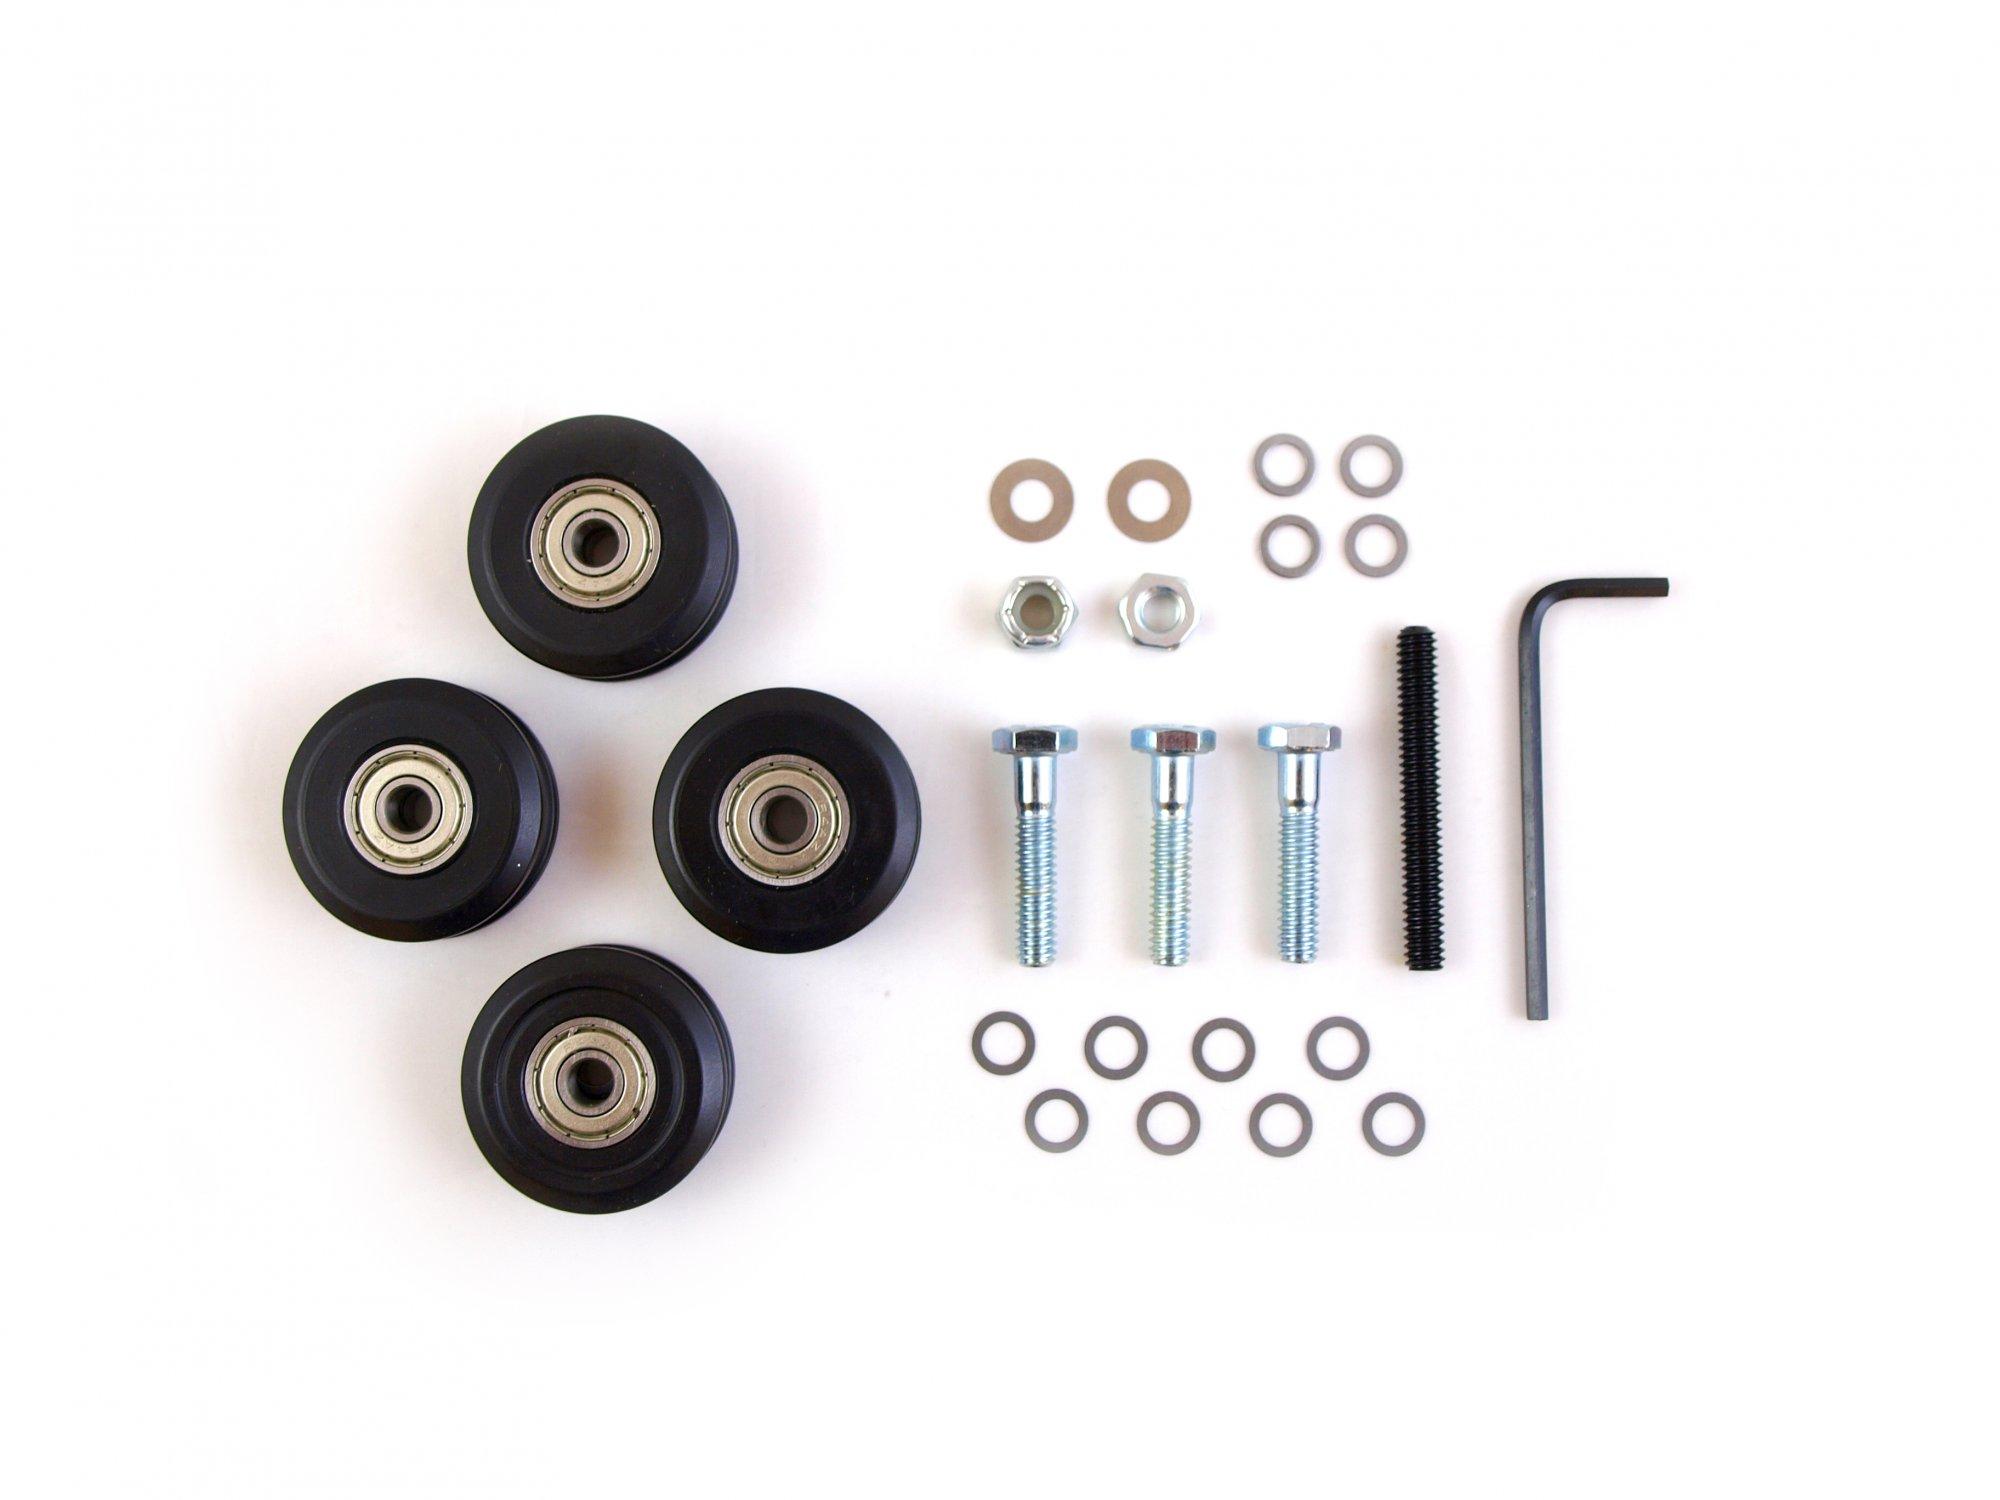 Precision-Glide Machine Wheel Kit (4 wheels)